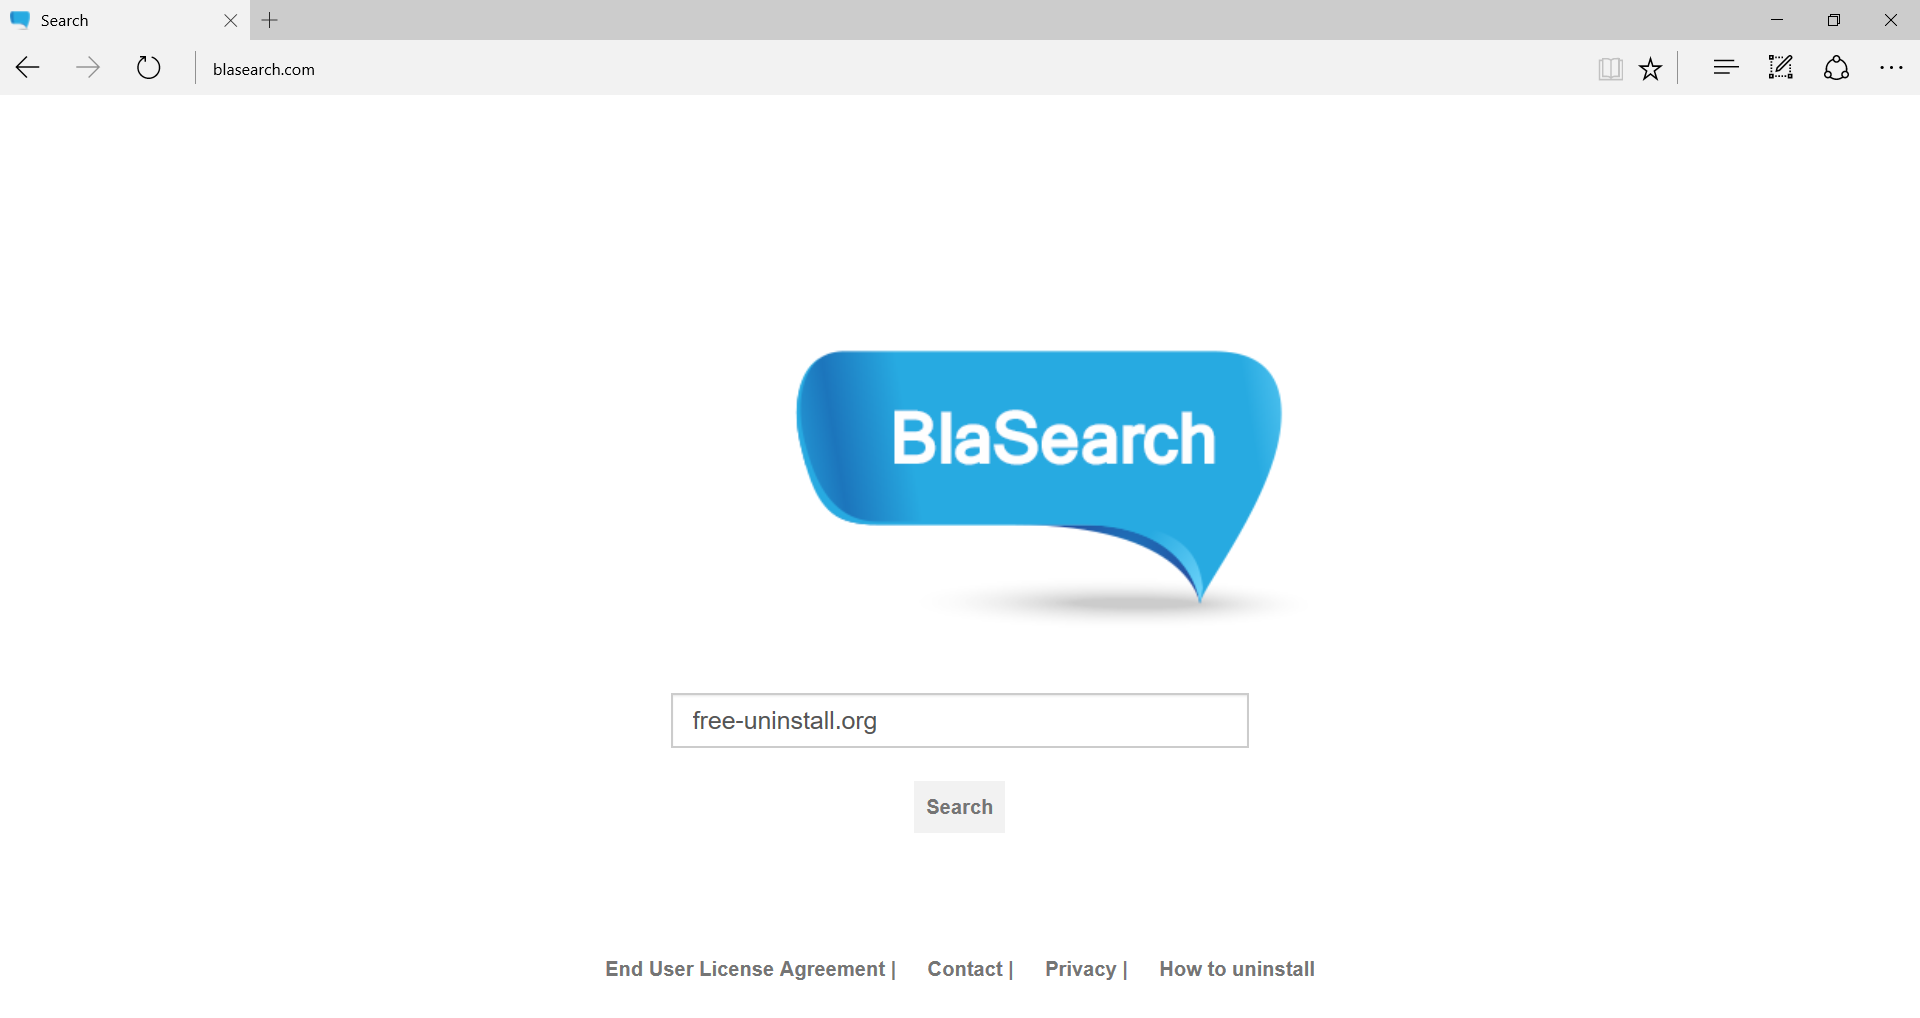 Blasearch.com Hijacker